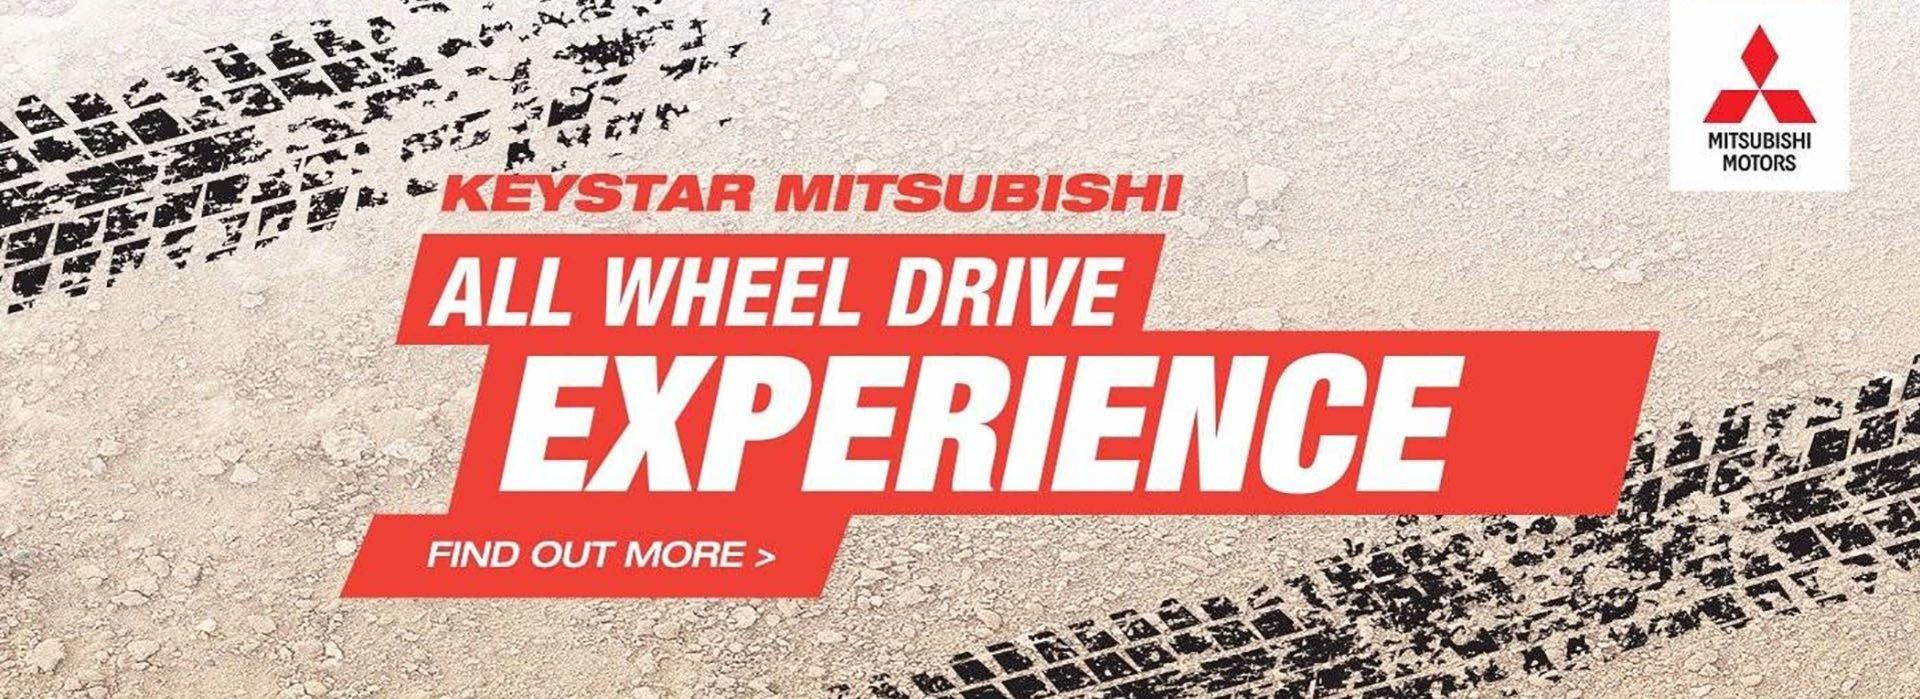 Keystar Mitsubishi AWD Experience